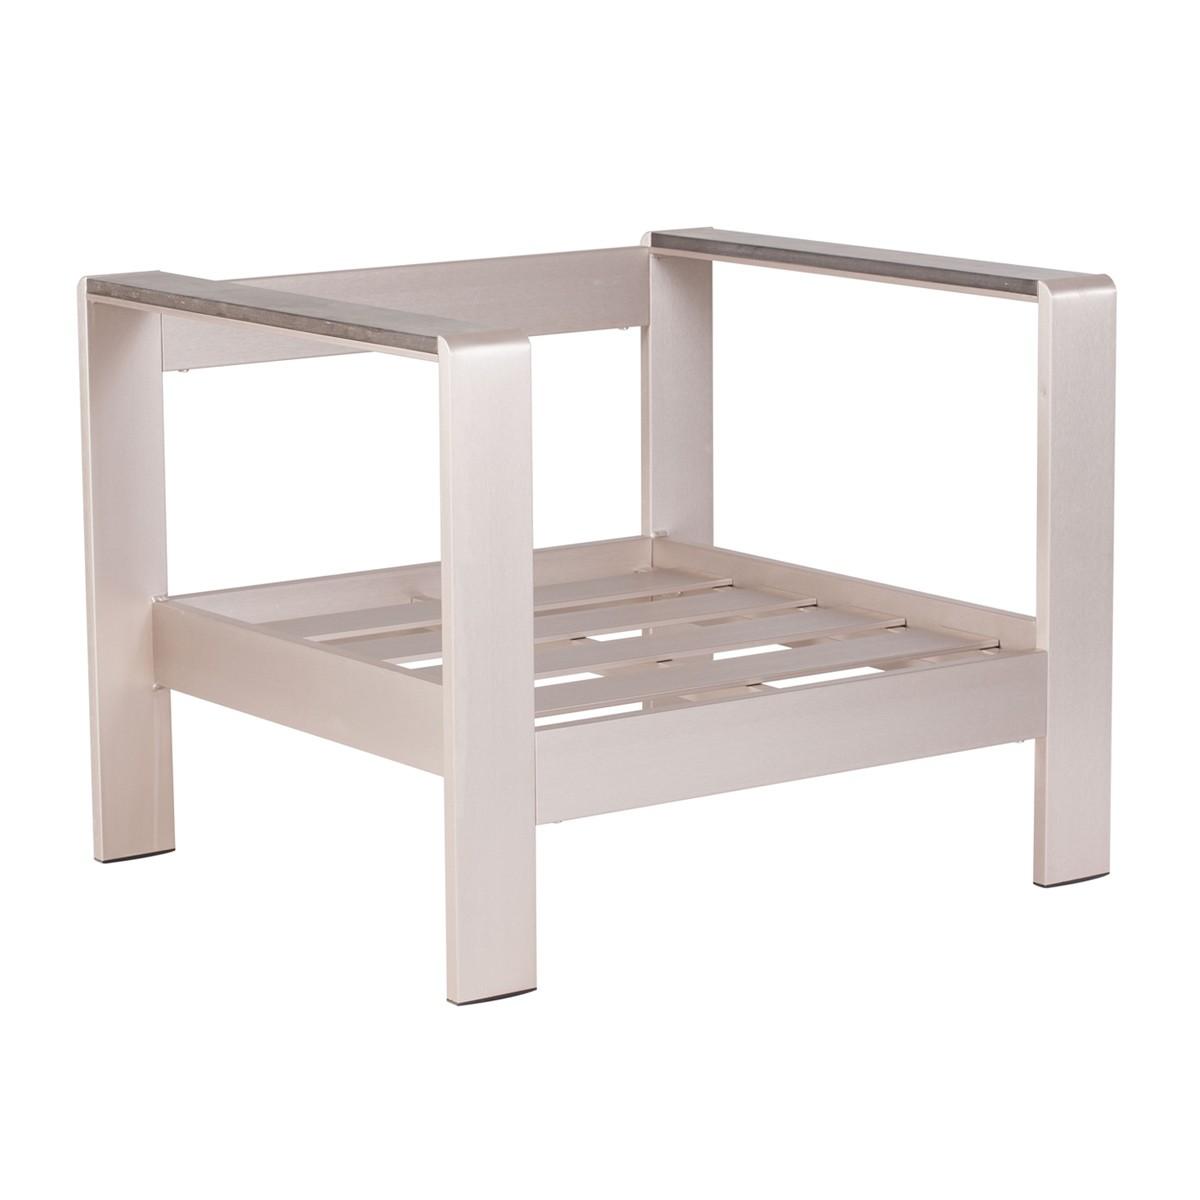 Zuo Modern Cosmopolitan Arm Chair Frame - Brushed Aluminum